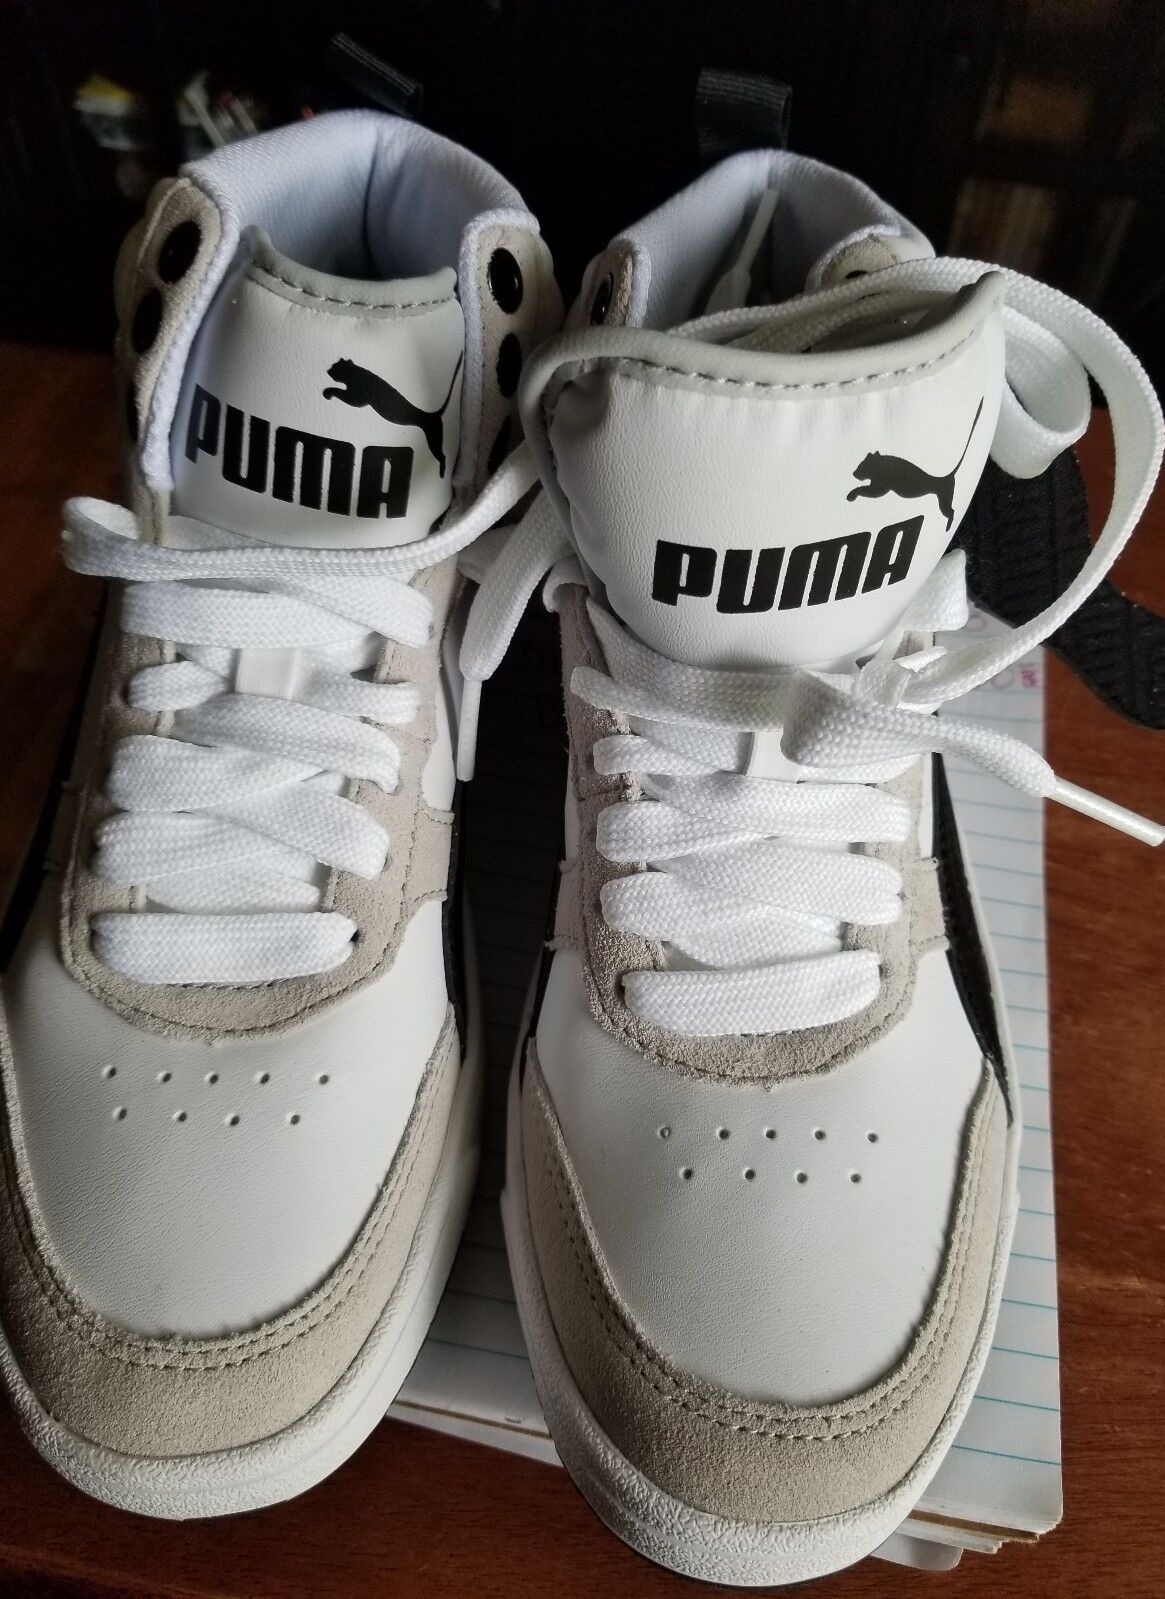 9ec50a3a4b83 PUMA 36391601 Kids Rebound Street V2 Sneaker- Choose Sz color. for ...